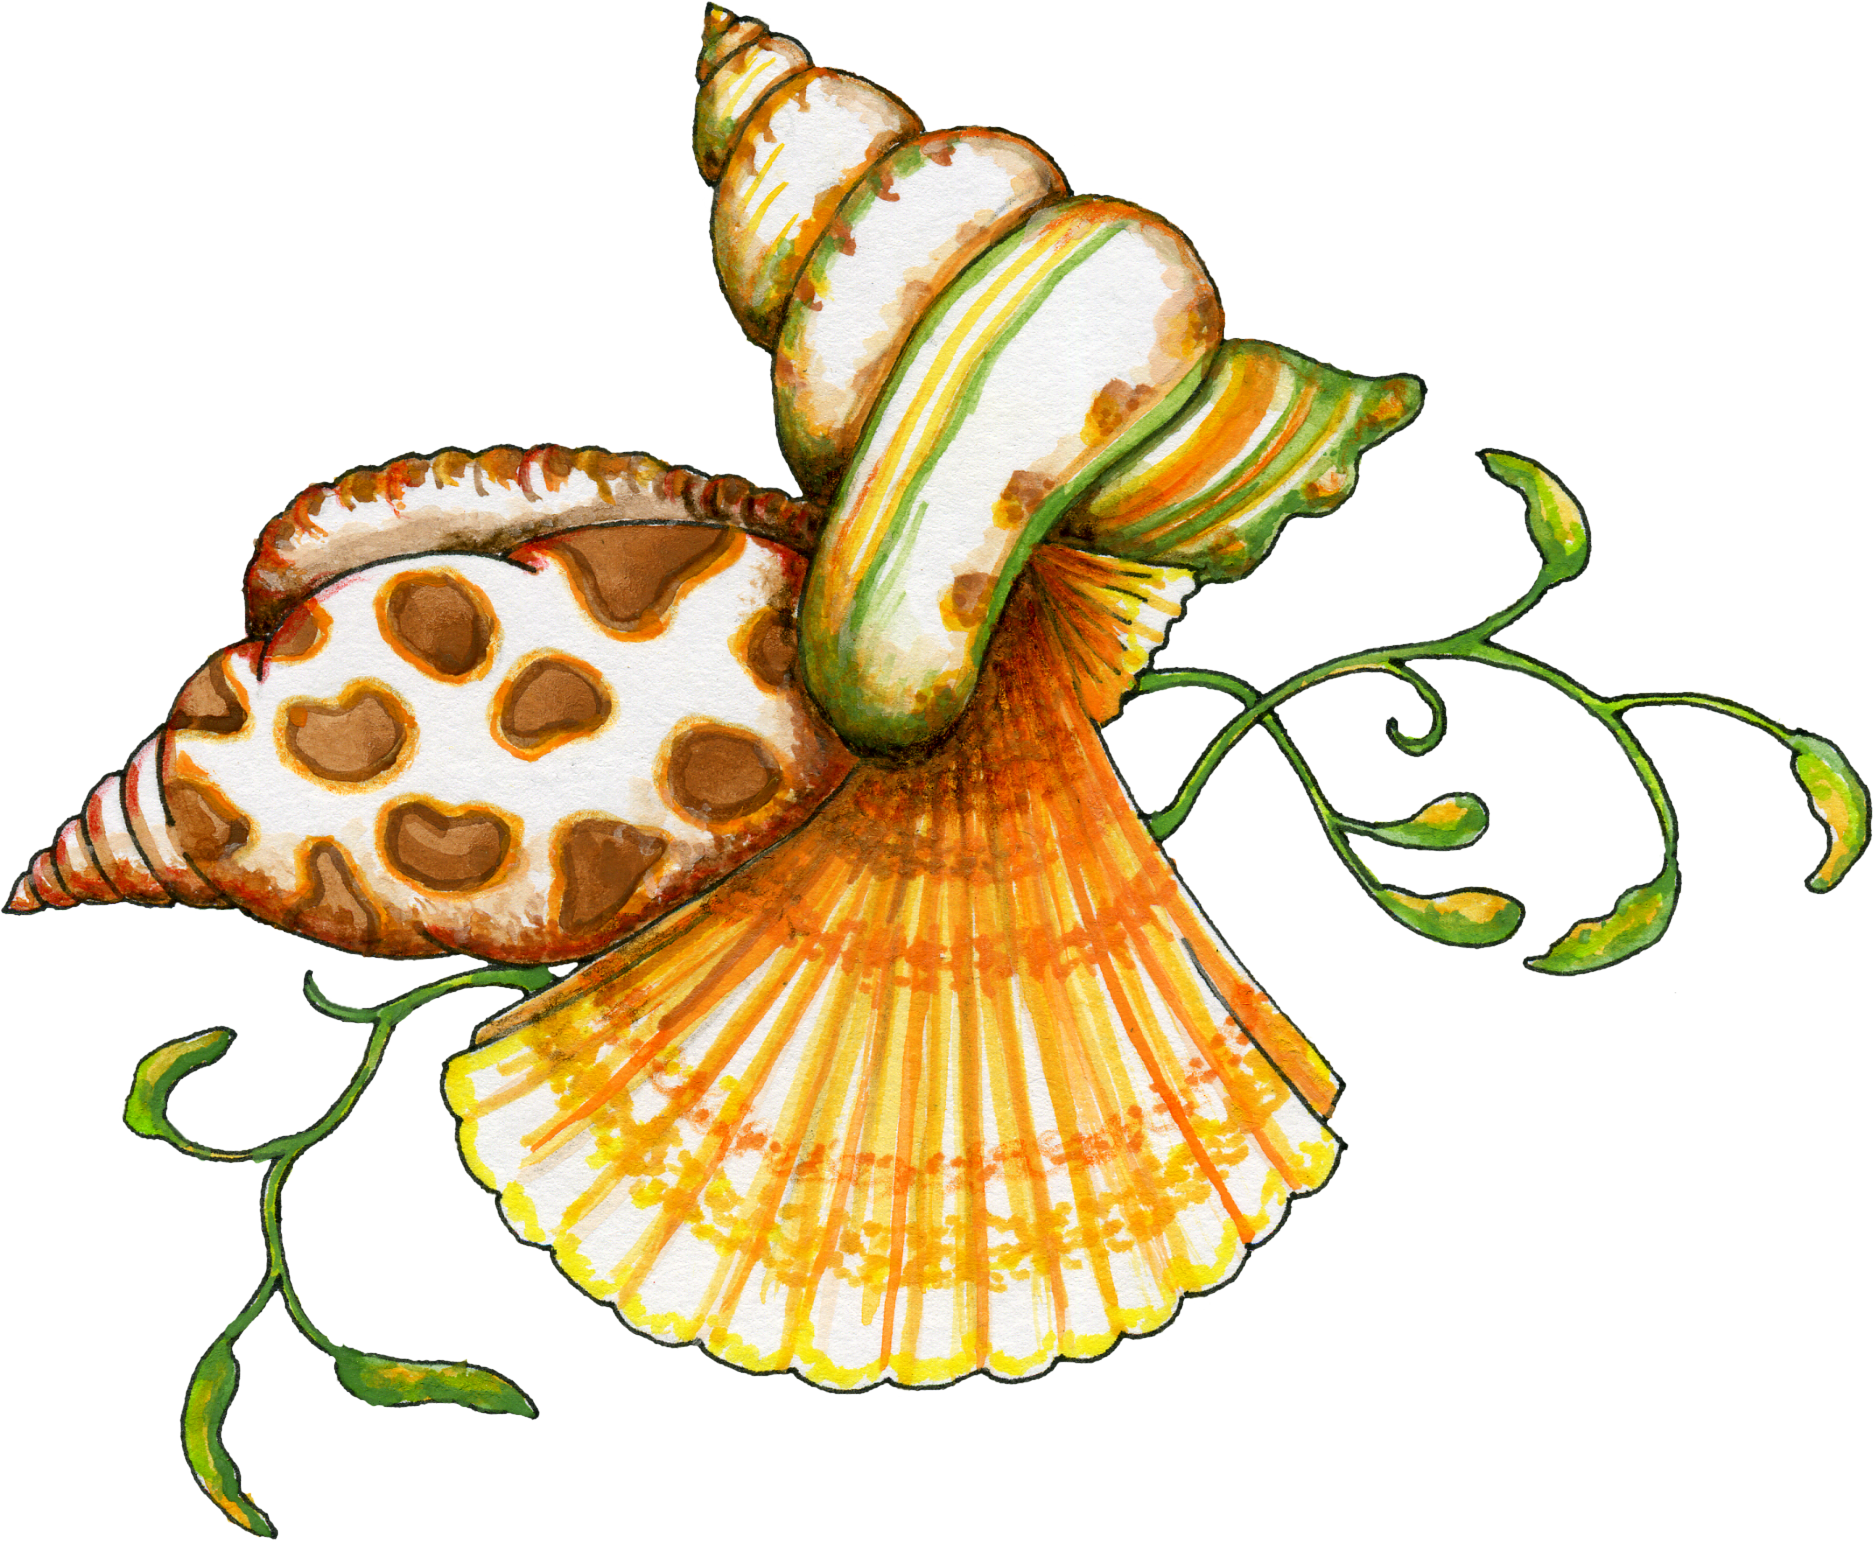 image transparent download Seashells clipart. Free transparent png files.